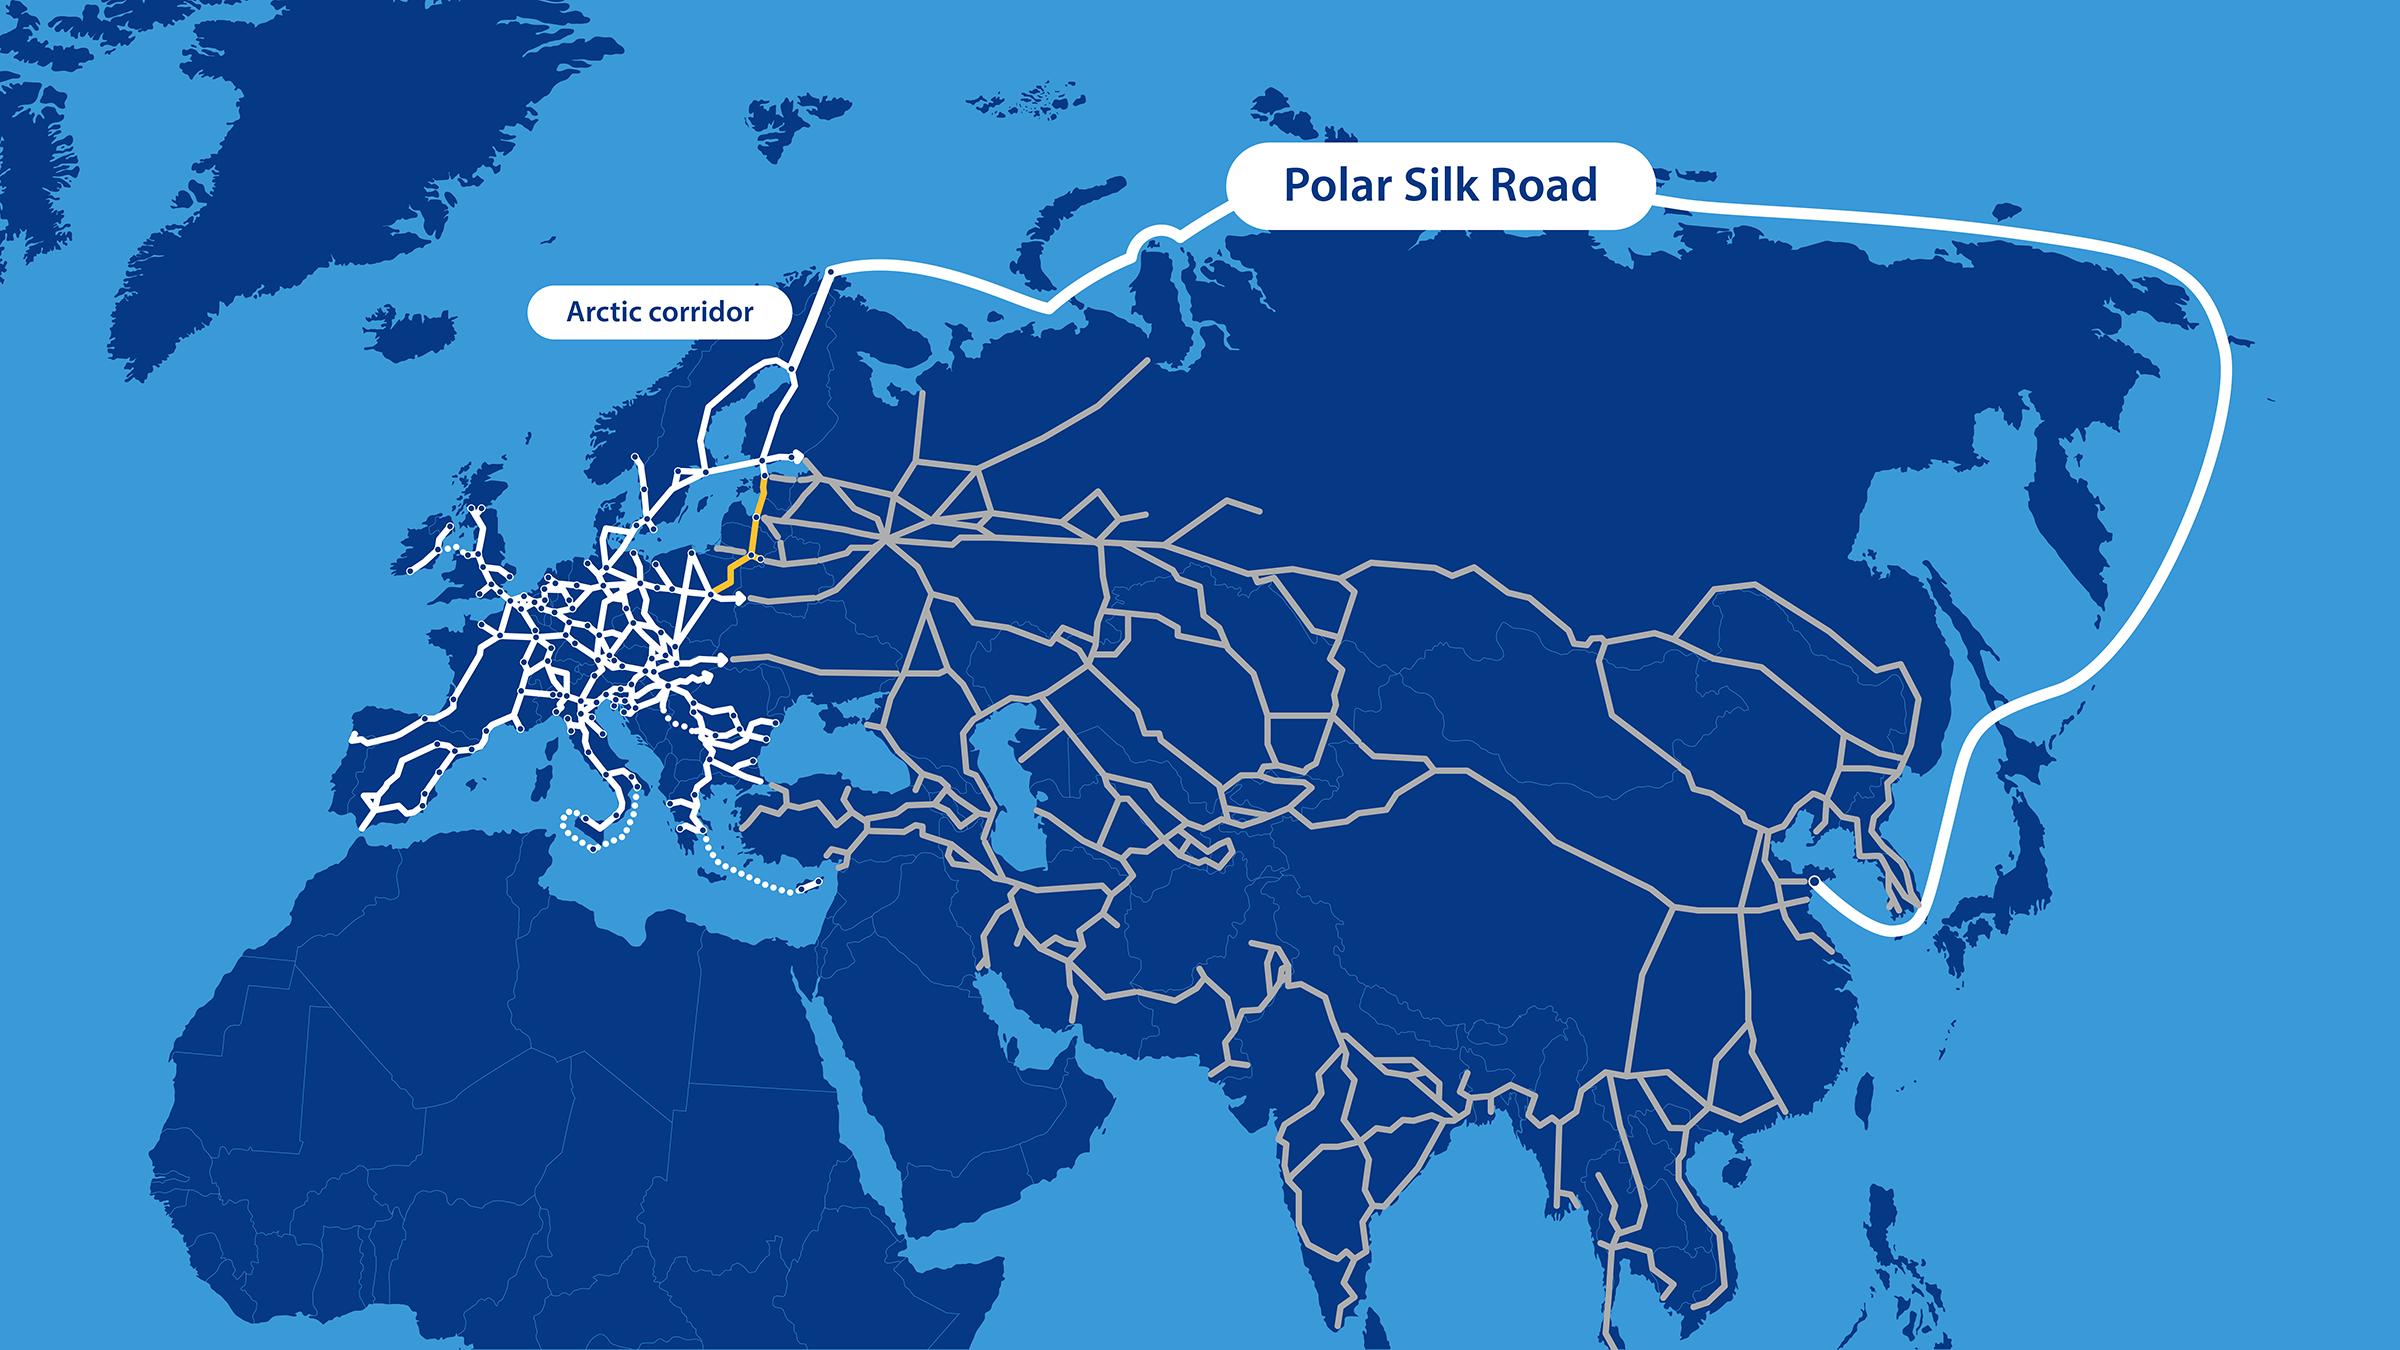 Daihatsu Fourtrak Wiring Diagram Sportrak Estonia Road Map Image Collections Writing Feroza Hijet